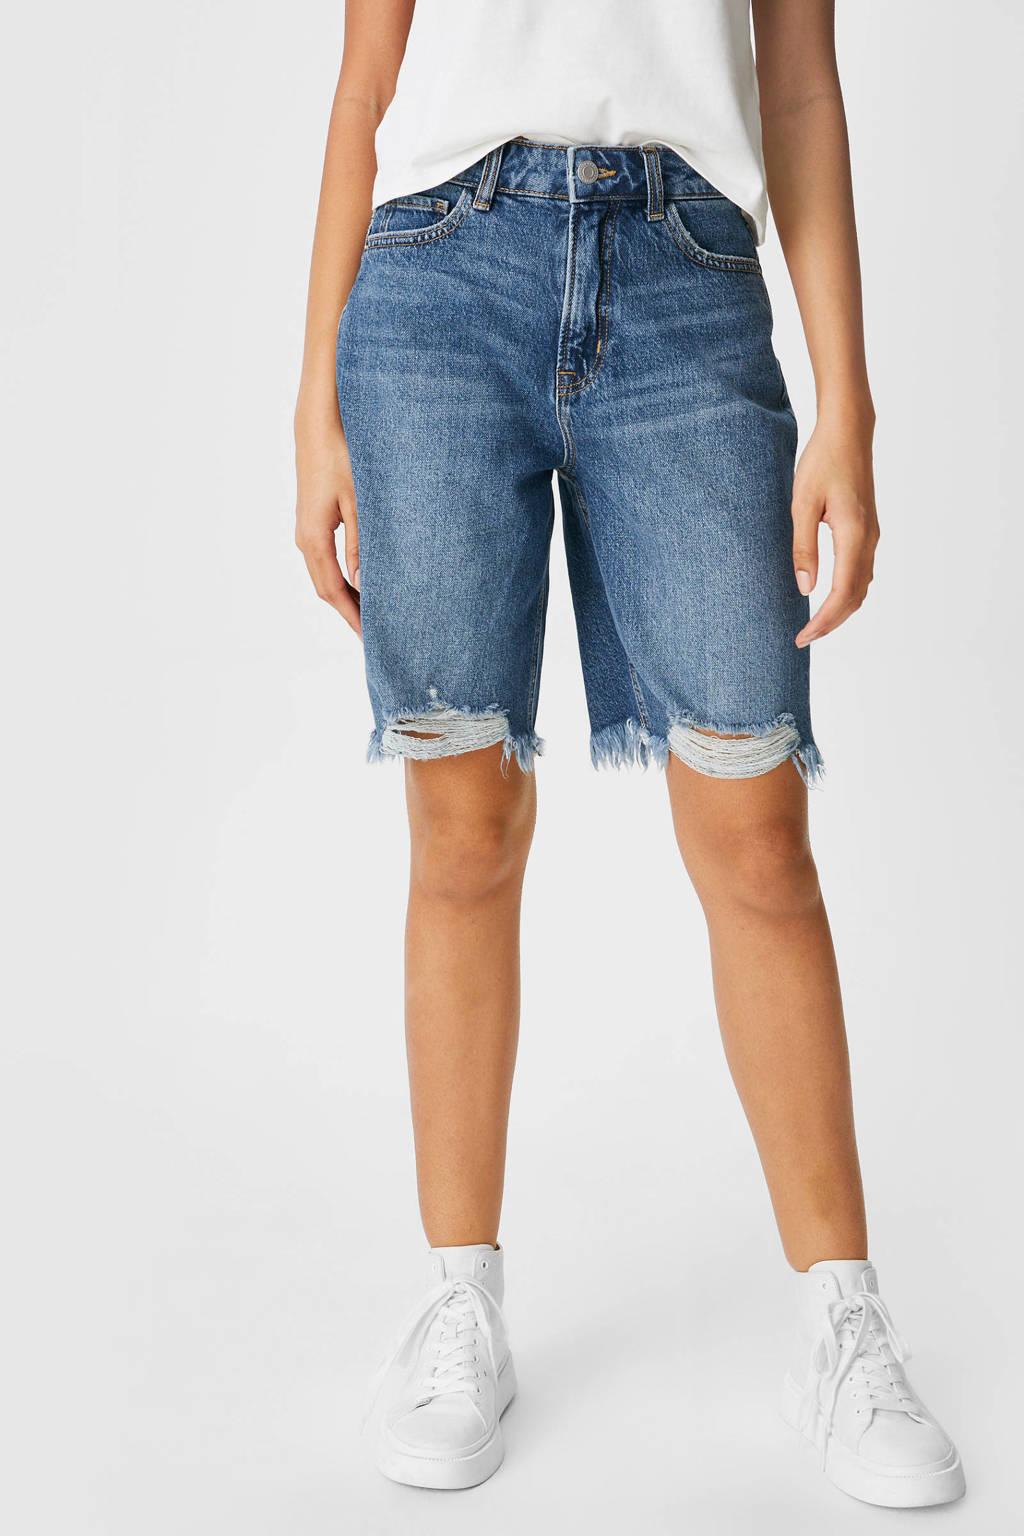 C&A Clockhouse high waist straight fit jeans short blauw, Blauw